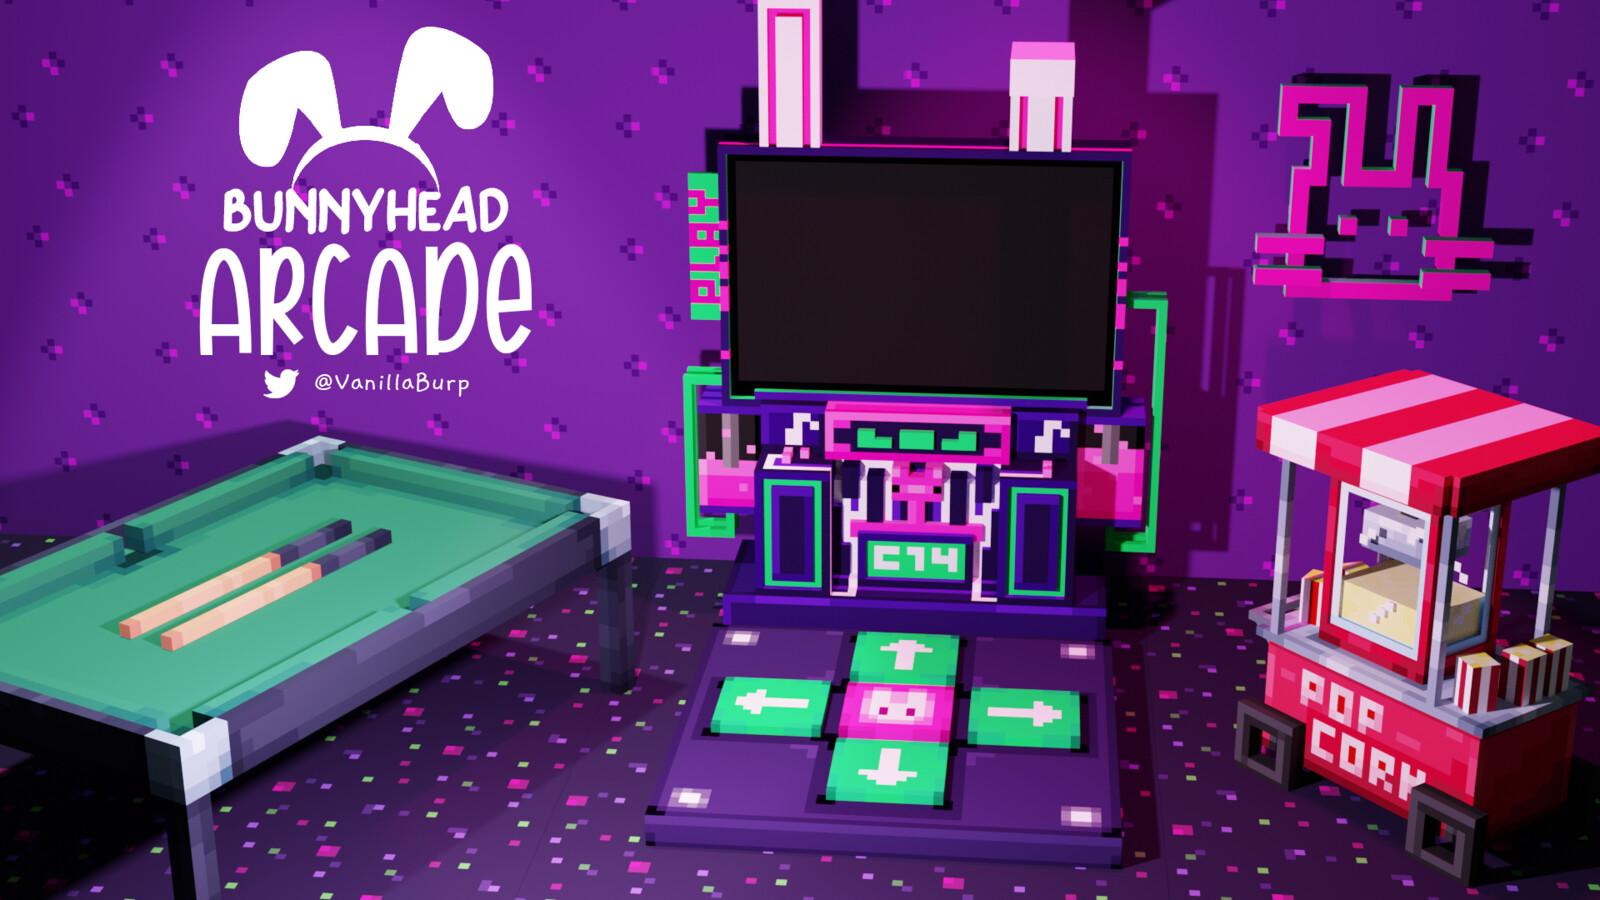 Bunnyhead Arcade